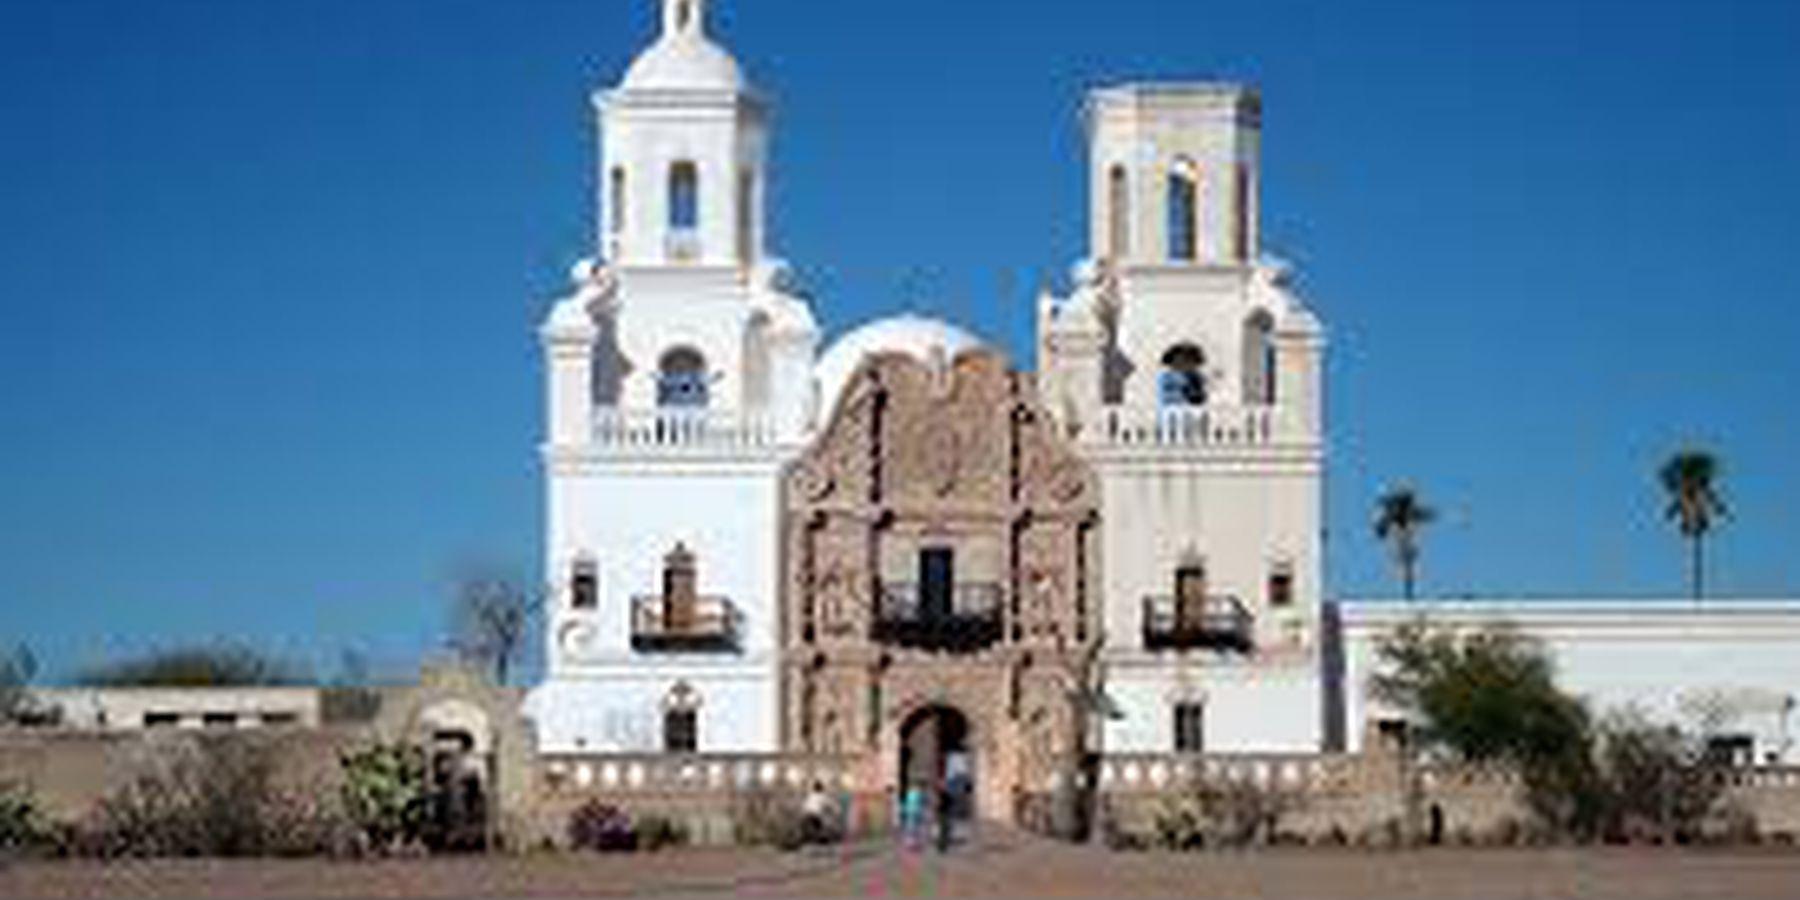 Mission San Xavier del Bac - Tucson - Arizona - Doets Reizen